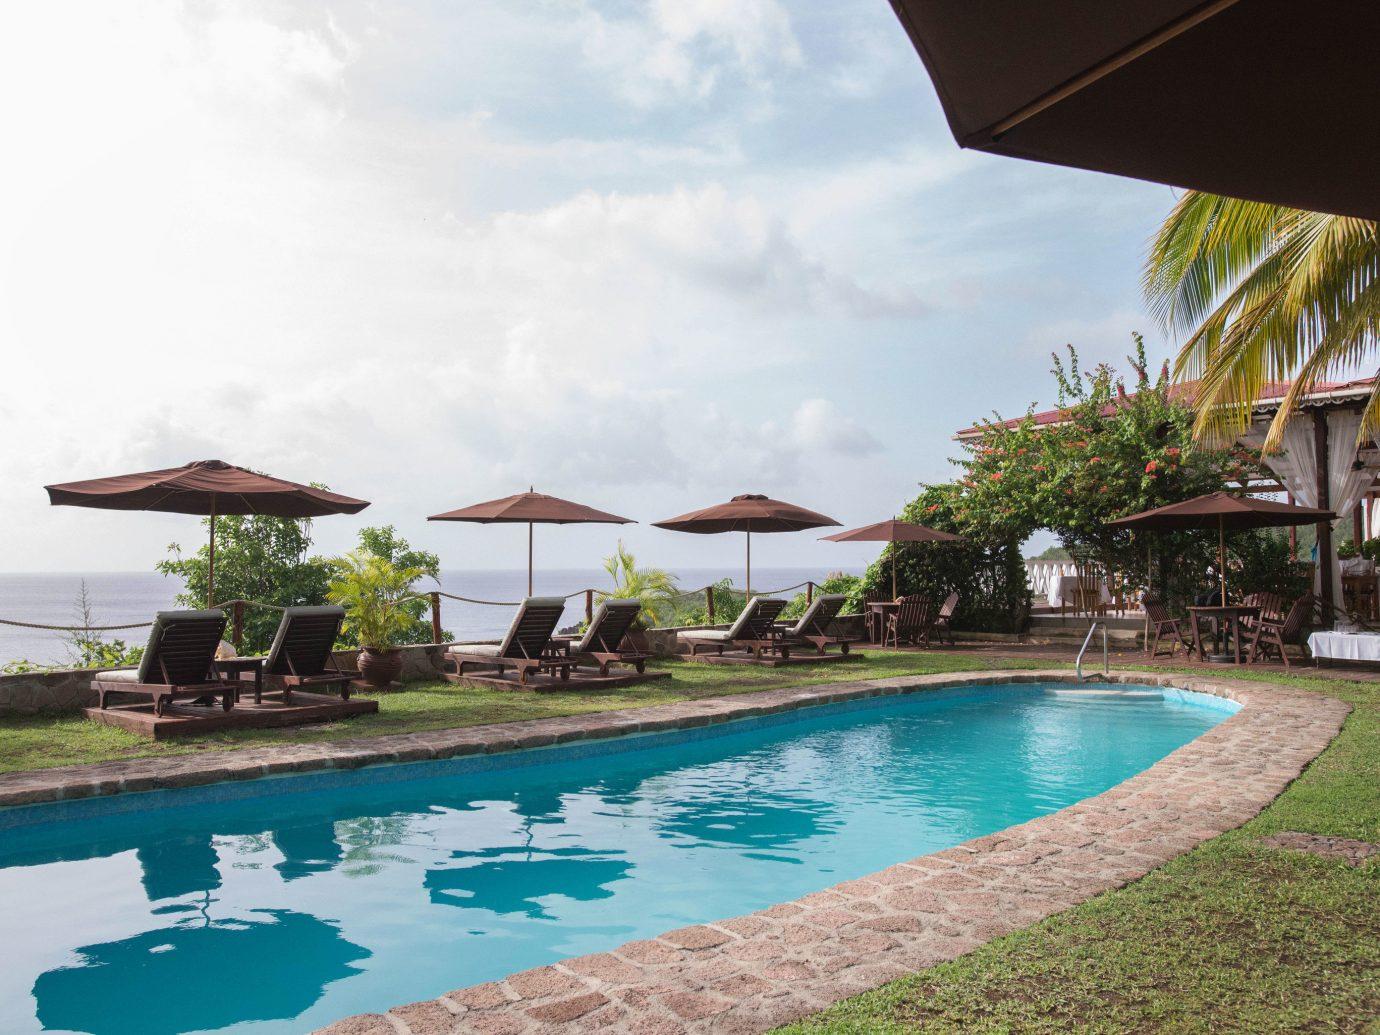 Hotels outdoor sky umbrella grass water Resort swimming pool Pool property leisure estate vacation lawn Villa real estate condominium swimming bay caribbean blue day